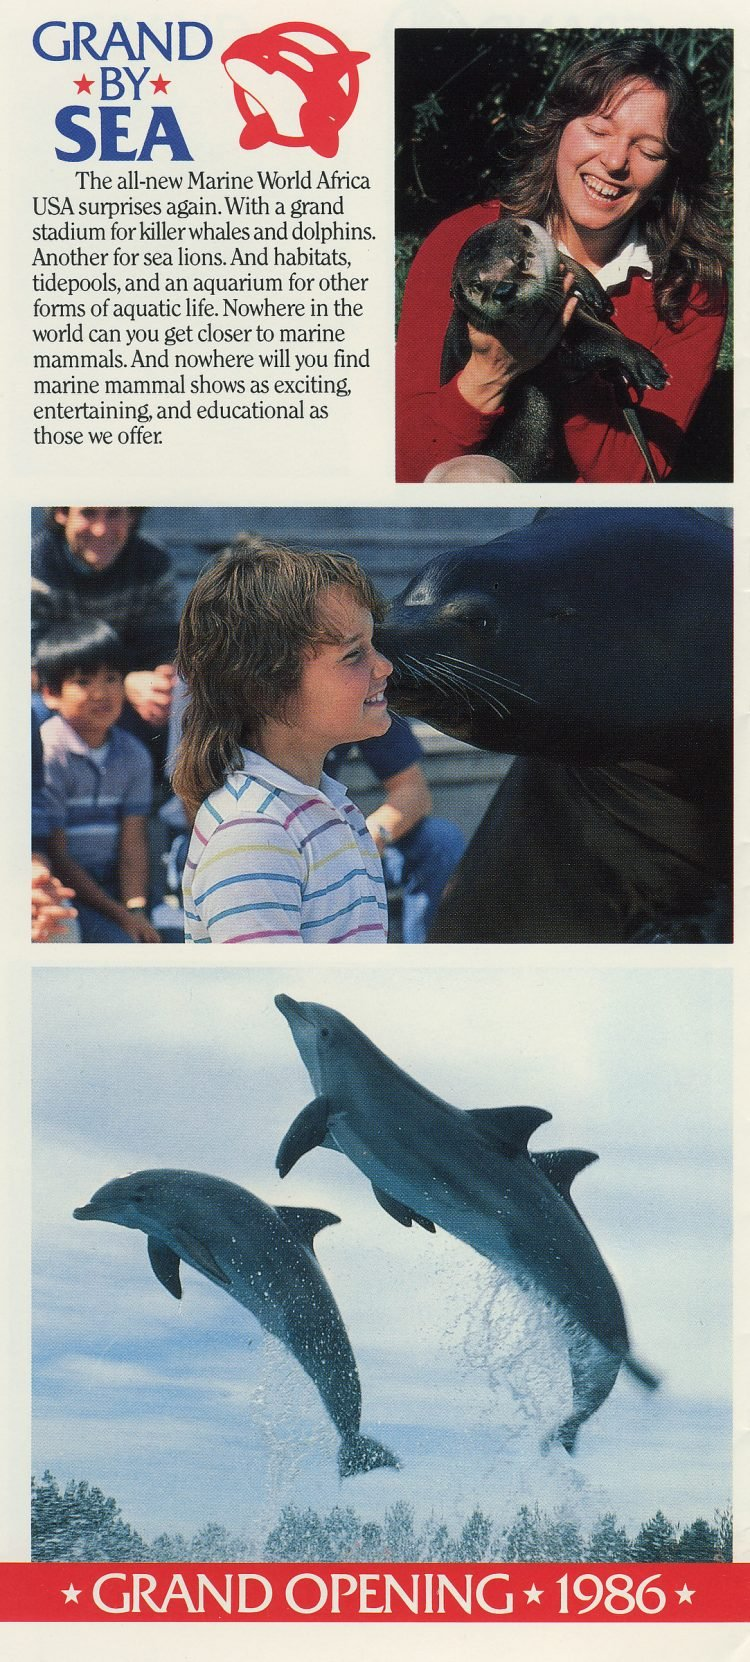 Marine World Africa USA - Grand Opening brochure 1986 (1)